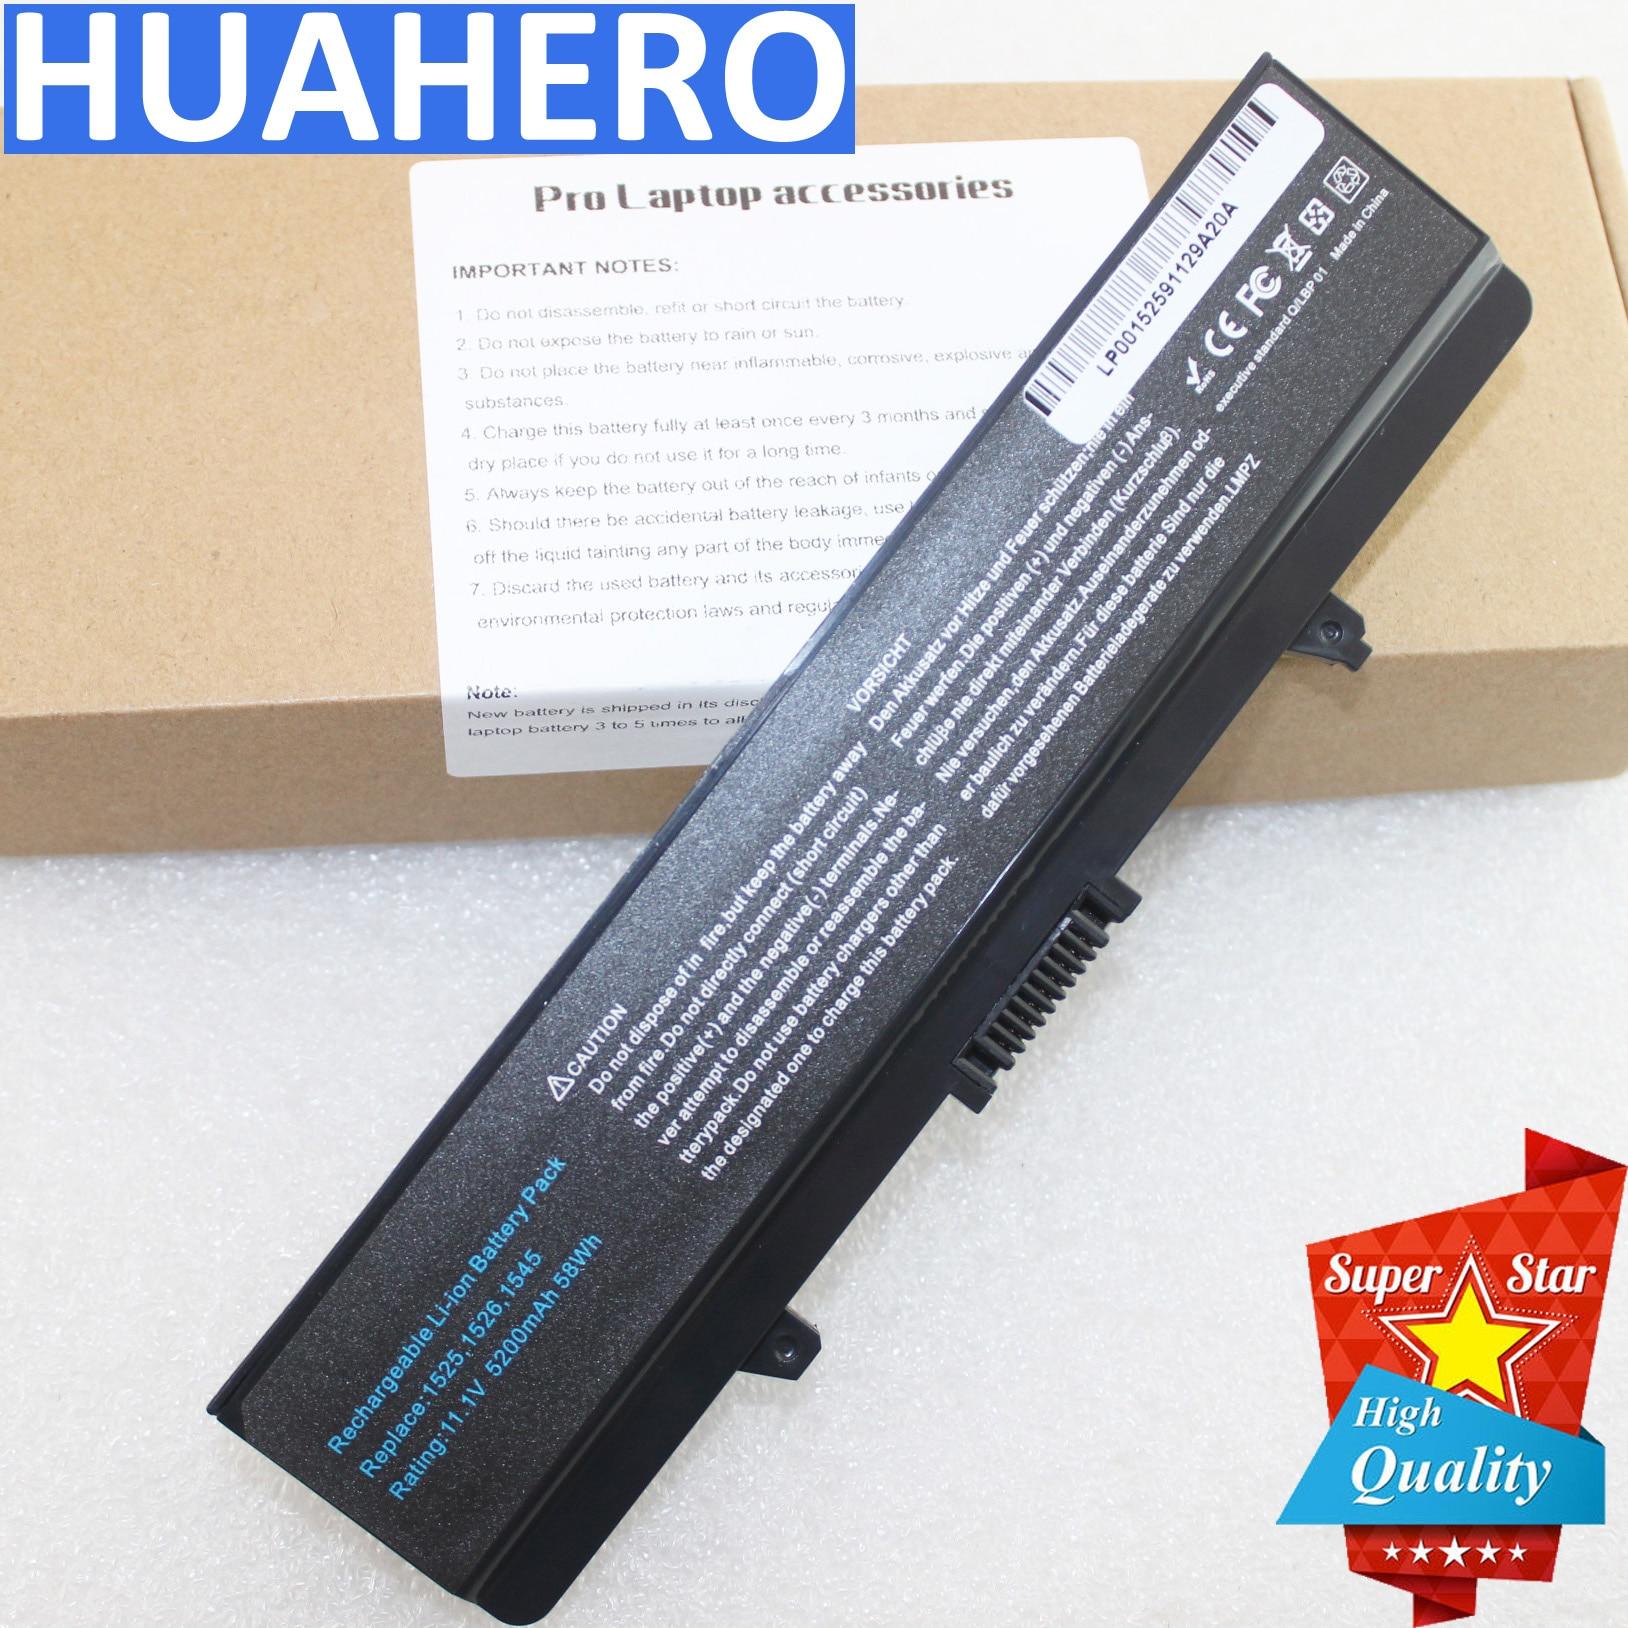 Battery for Dell Inspiron 1525 1526 1440 1545 1546 1750 laptop GW240 X284G RN873 XR682 GW241 XR693 HP277 XR694 HP297 XR697 CR693